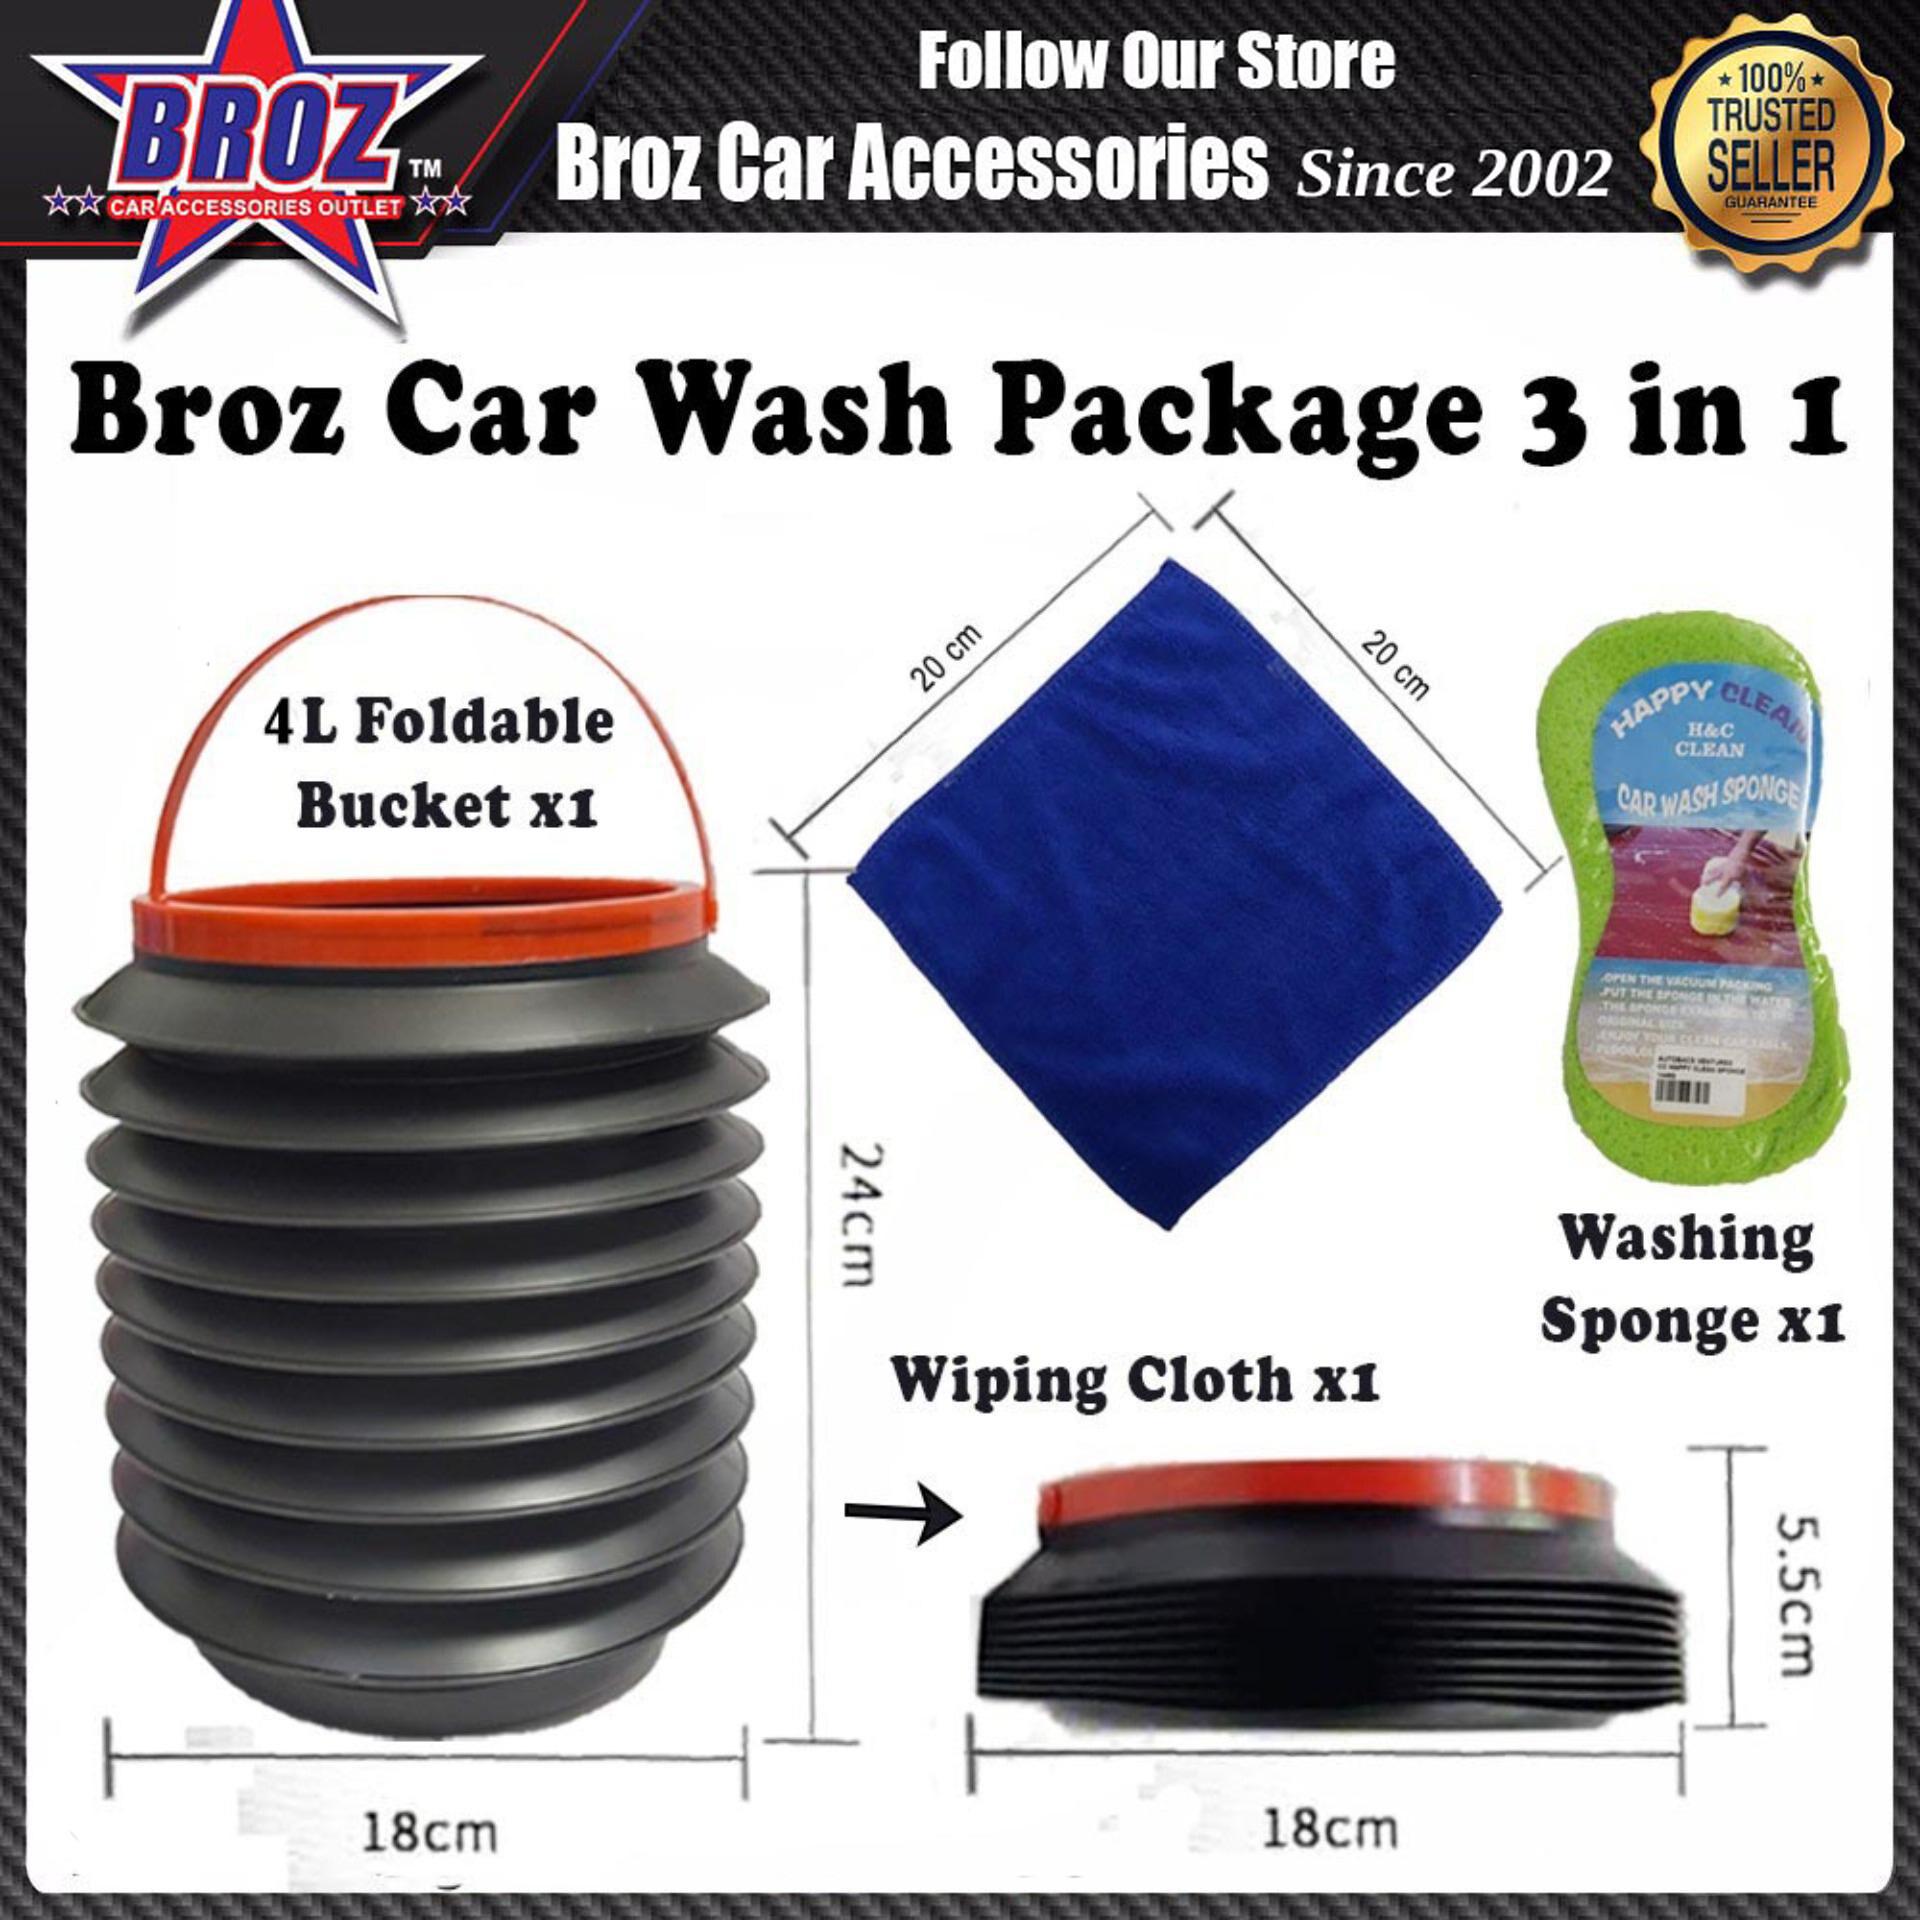 Broz Car Wash Package 3 in 1